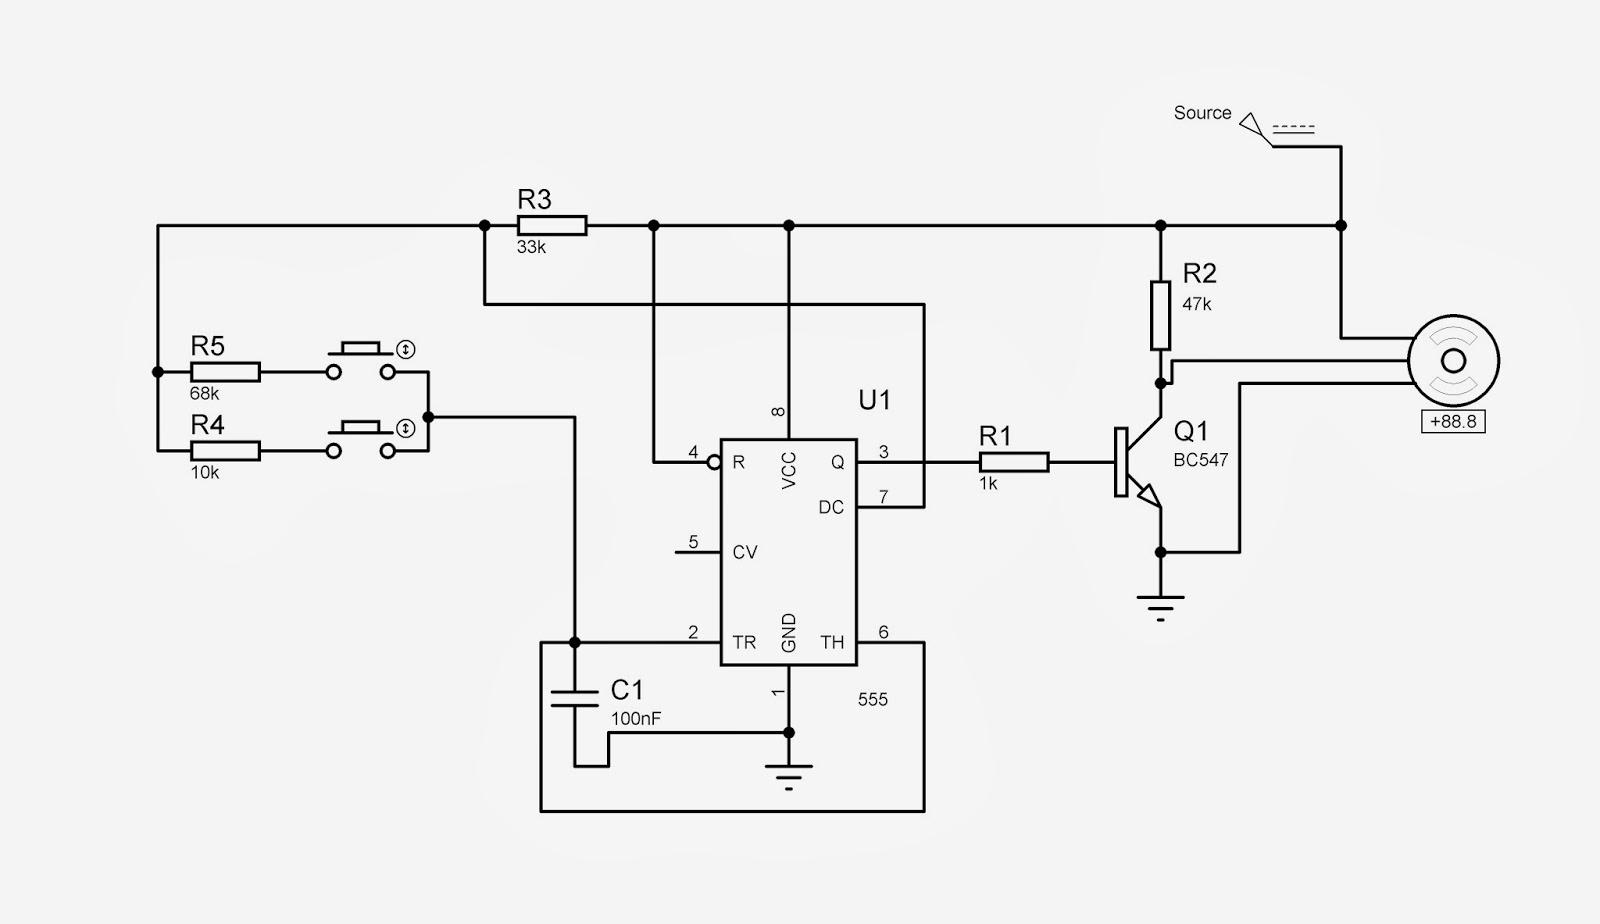 Fiat Grande Punto Stereo Wiring Diagram. Fiat. Auto Wiring